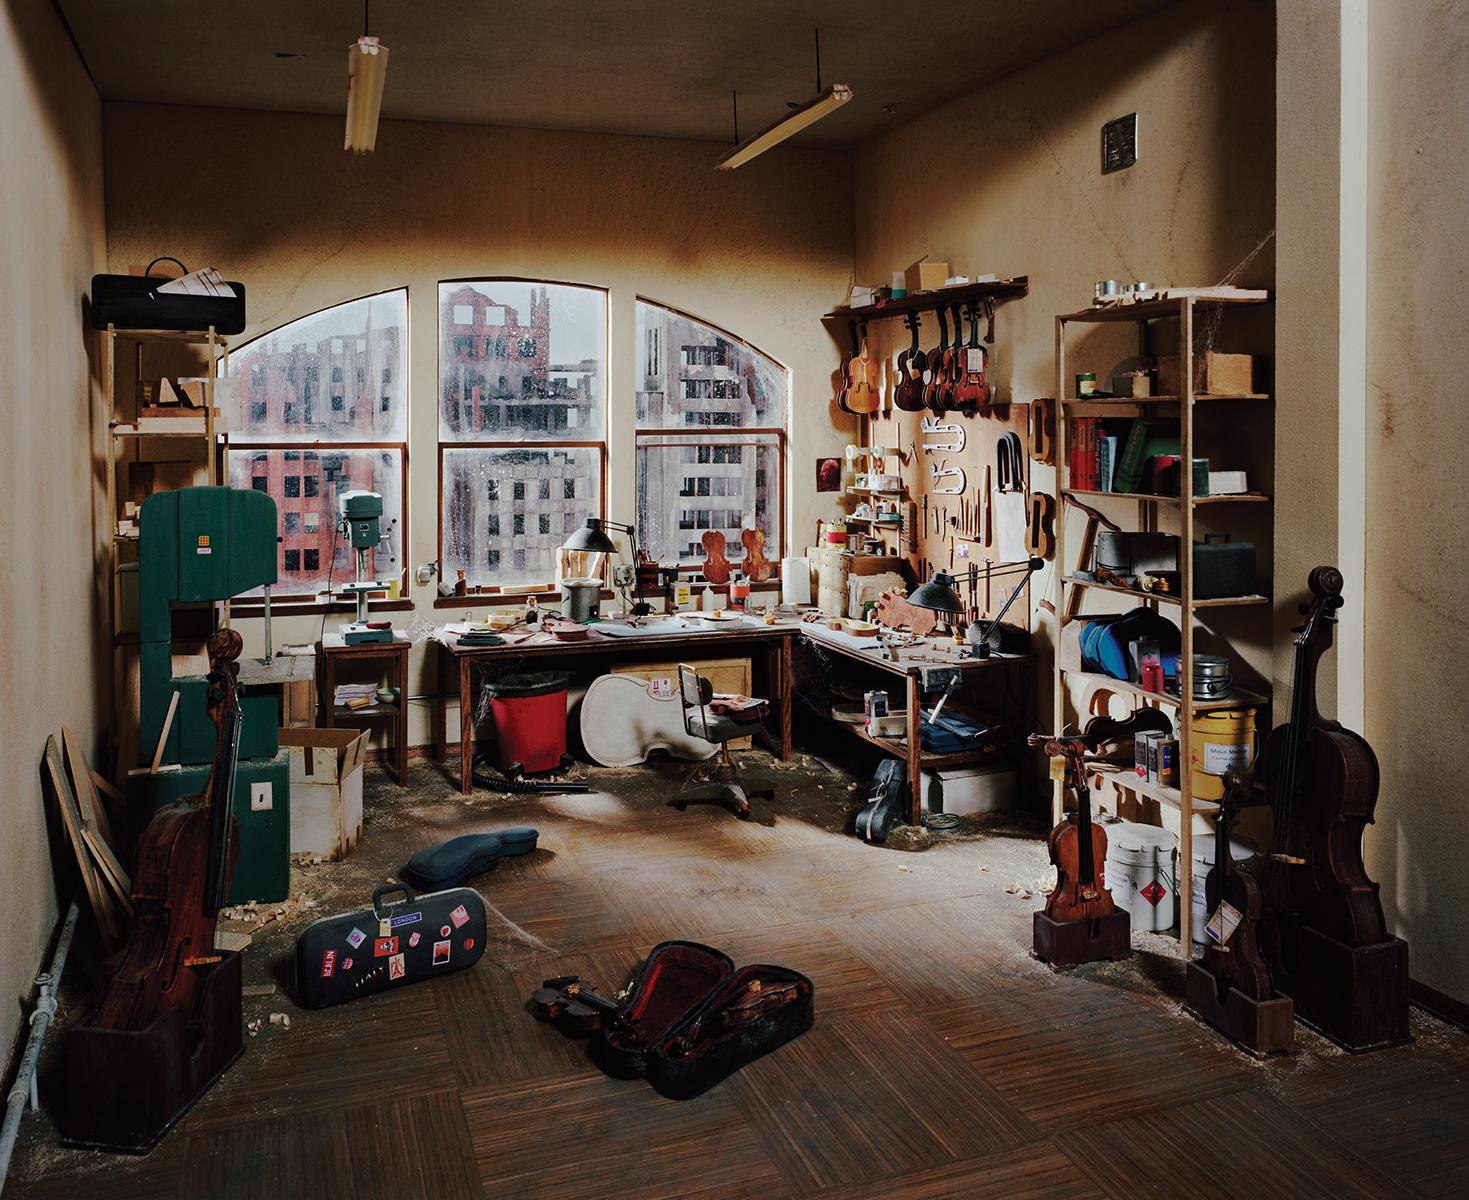 "Lori Nix and Kathleen Gerber, Violin Repair Shop, 2011. Chromogenic Print, 48 x 65"". Courtesy of Bau-Xi Photo."